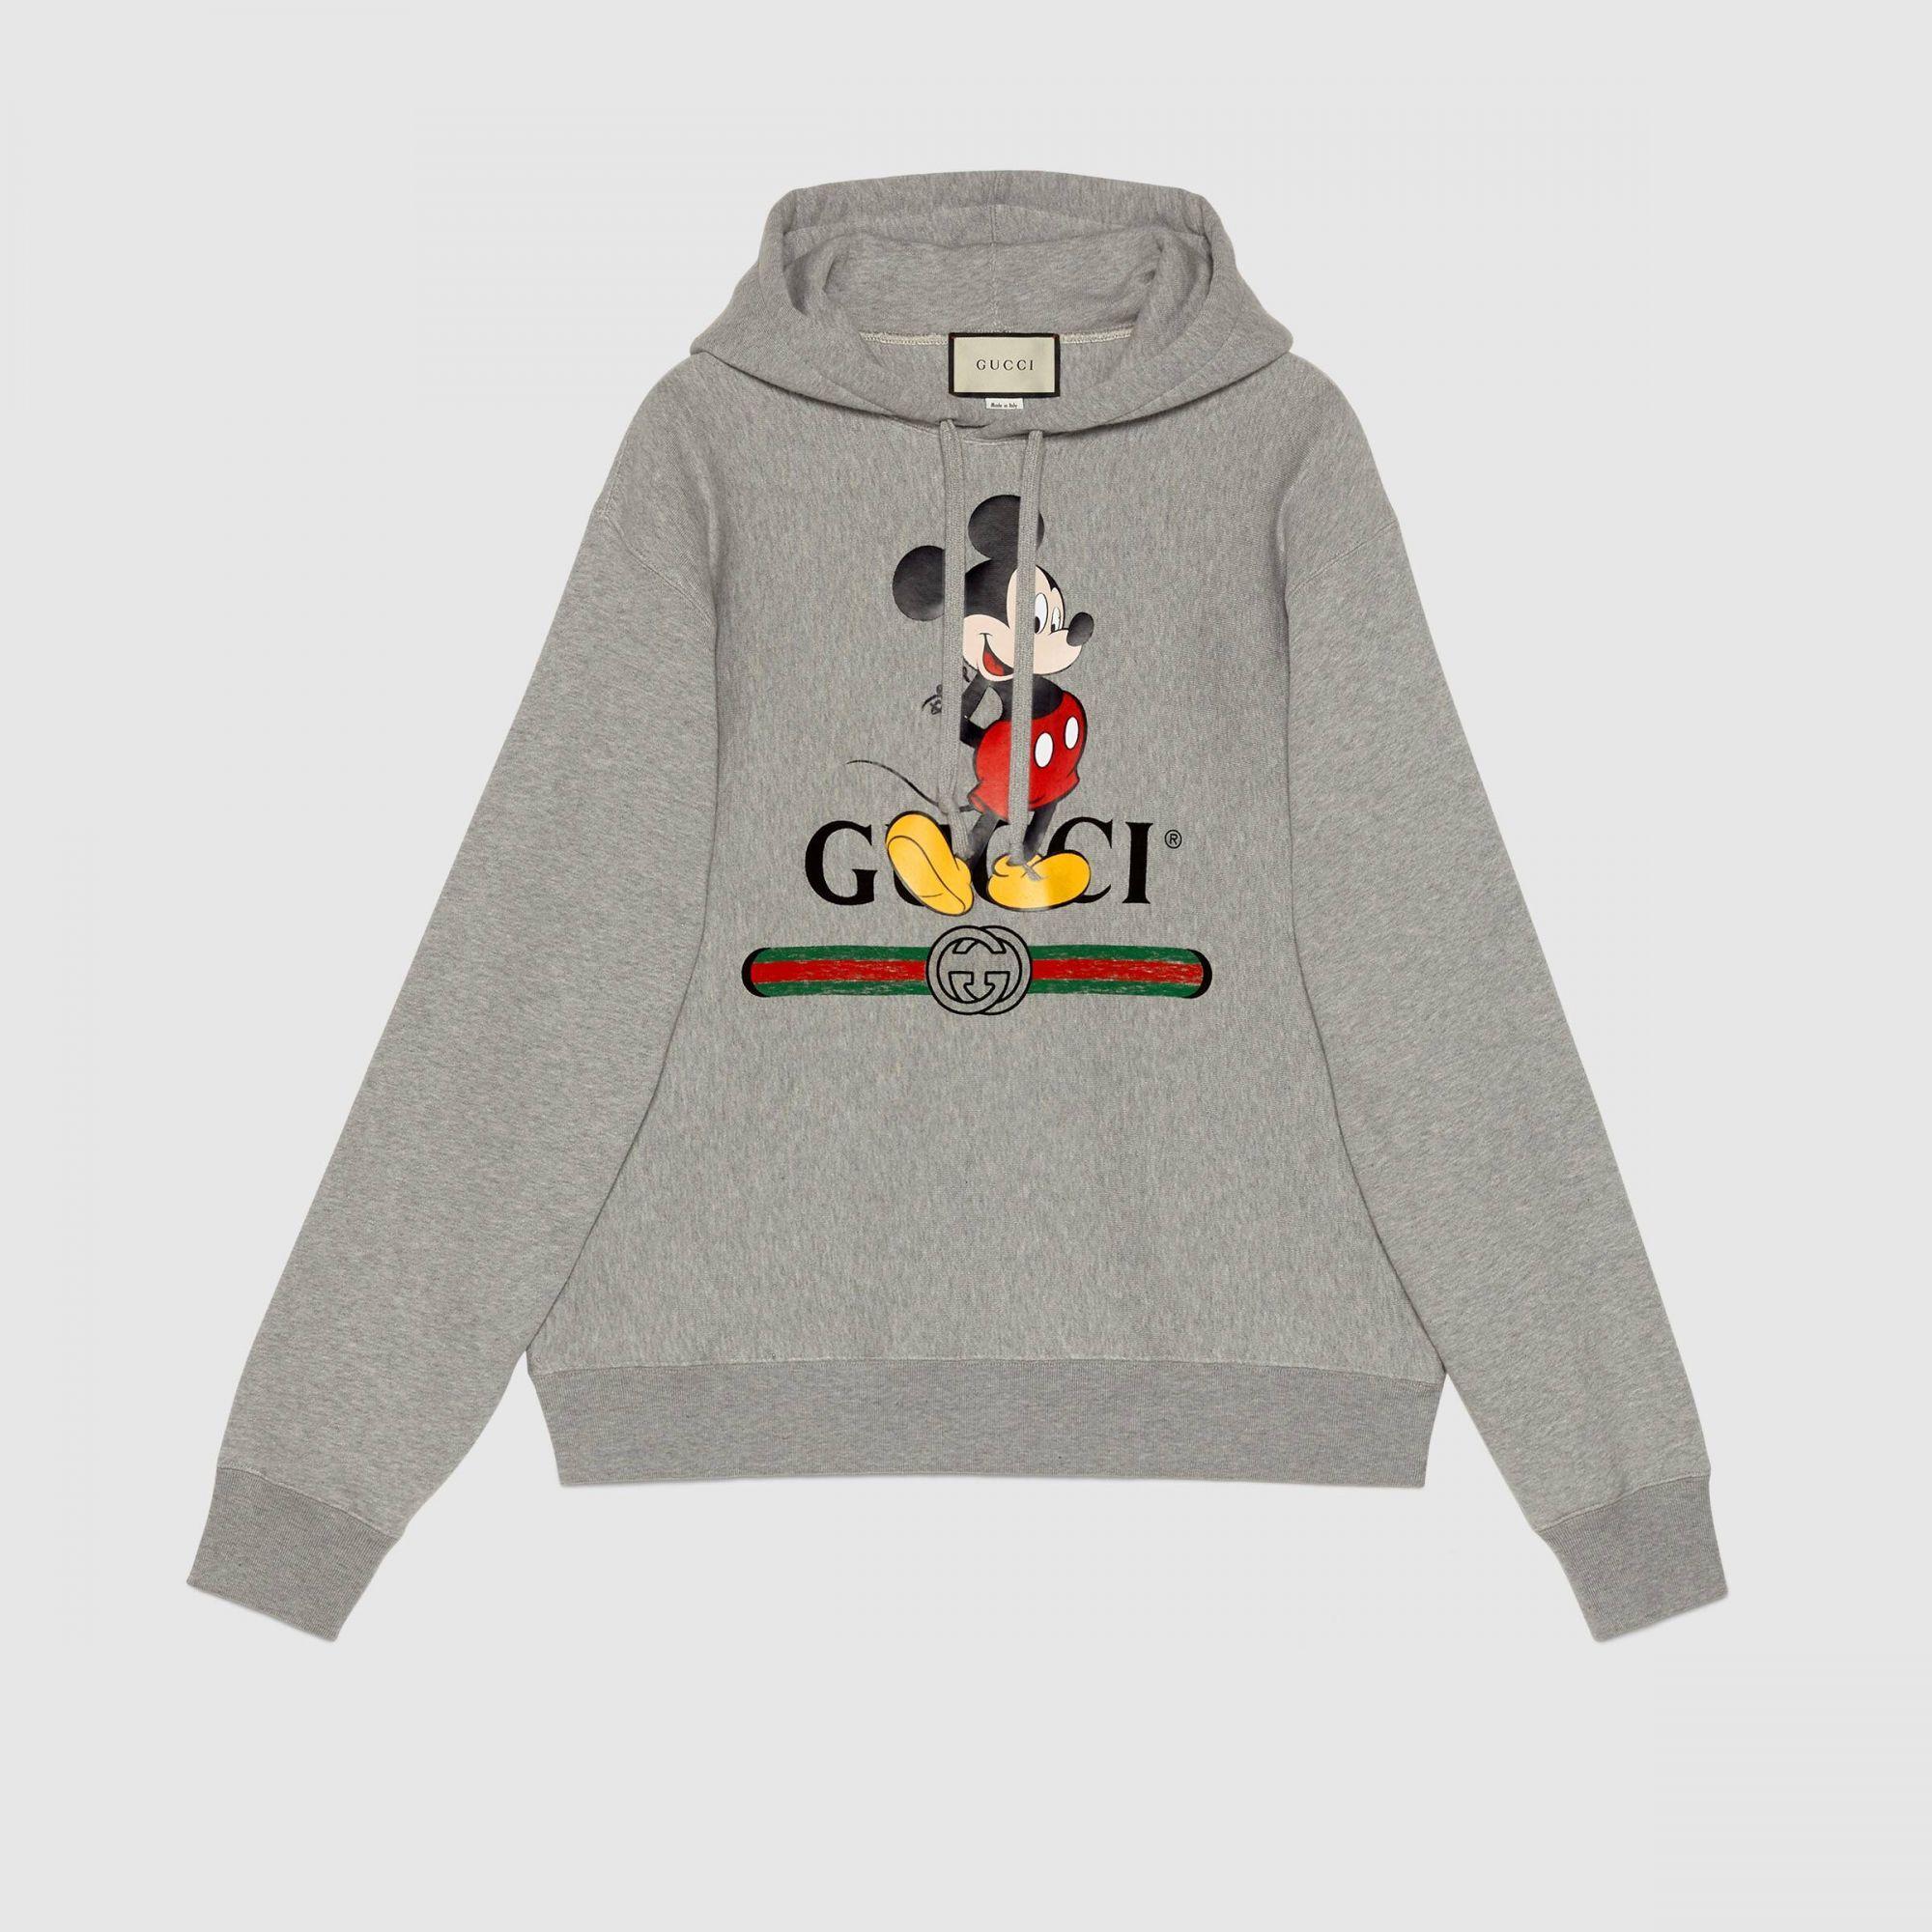 Felpa Gucci x Disney - Neomag.